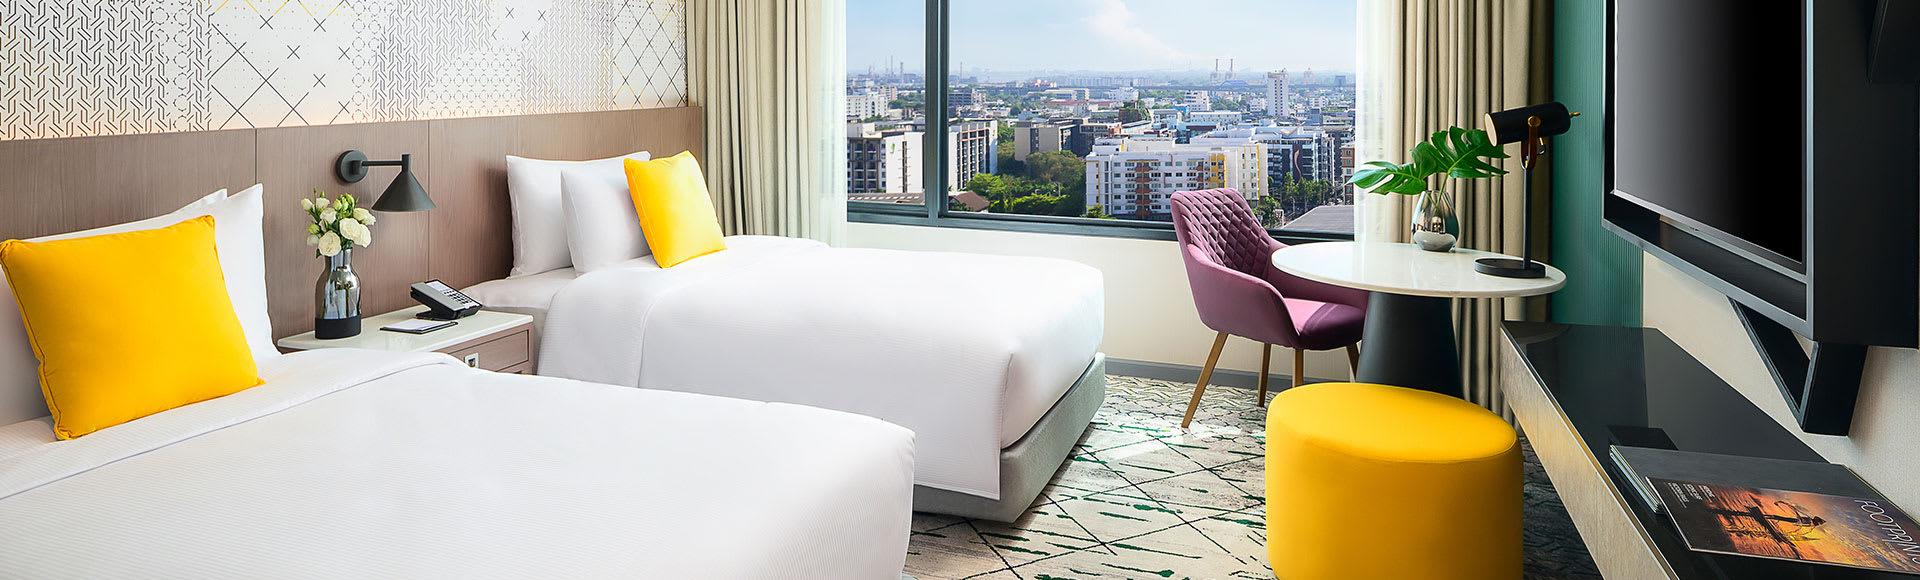 Mini Break Special at Avani Sukhumvit Bangkok Hotel